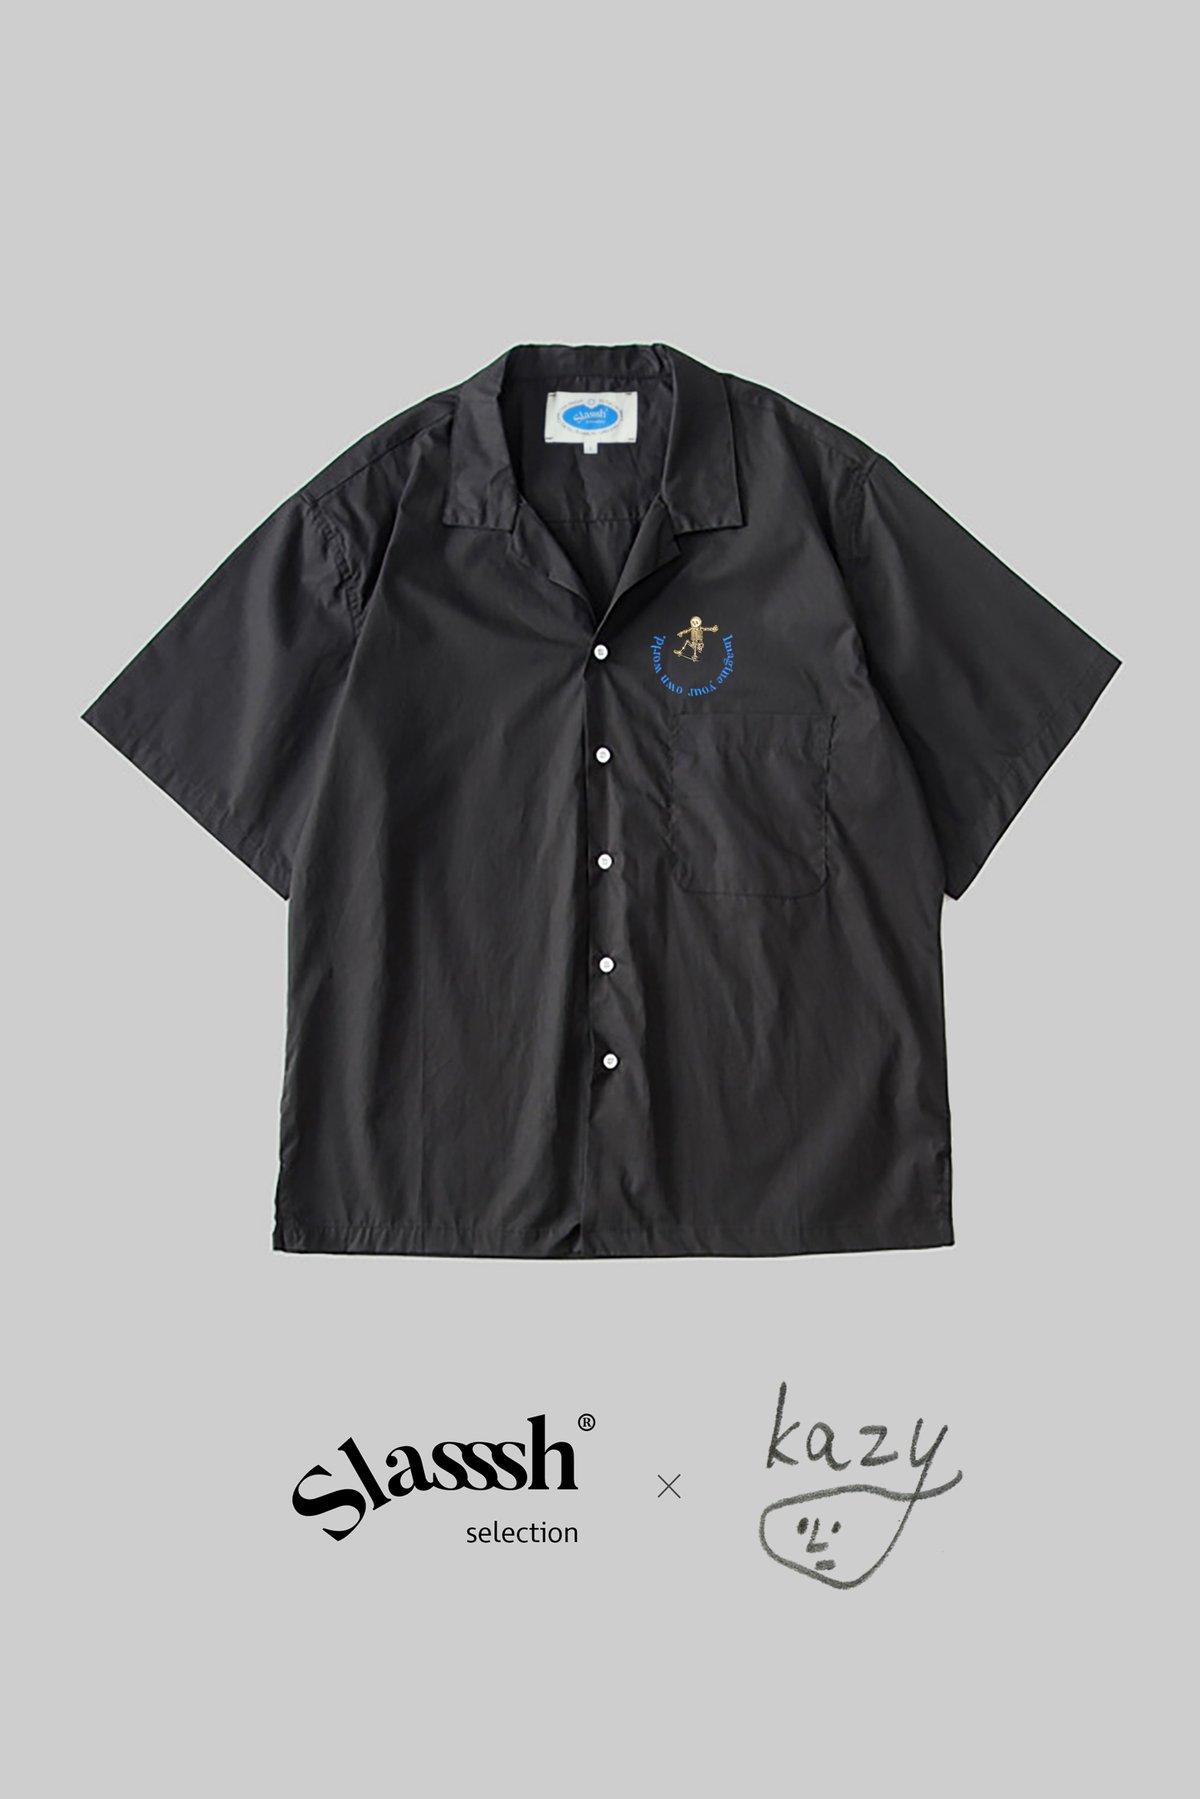 Graphic Embroidery Tee - Kazy Chan x Slasssh Embroidery Shirt